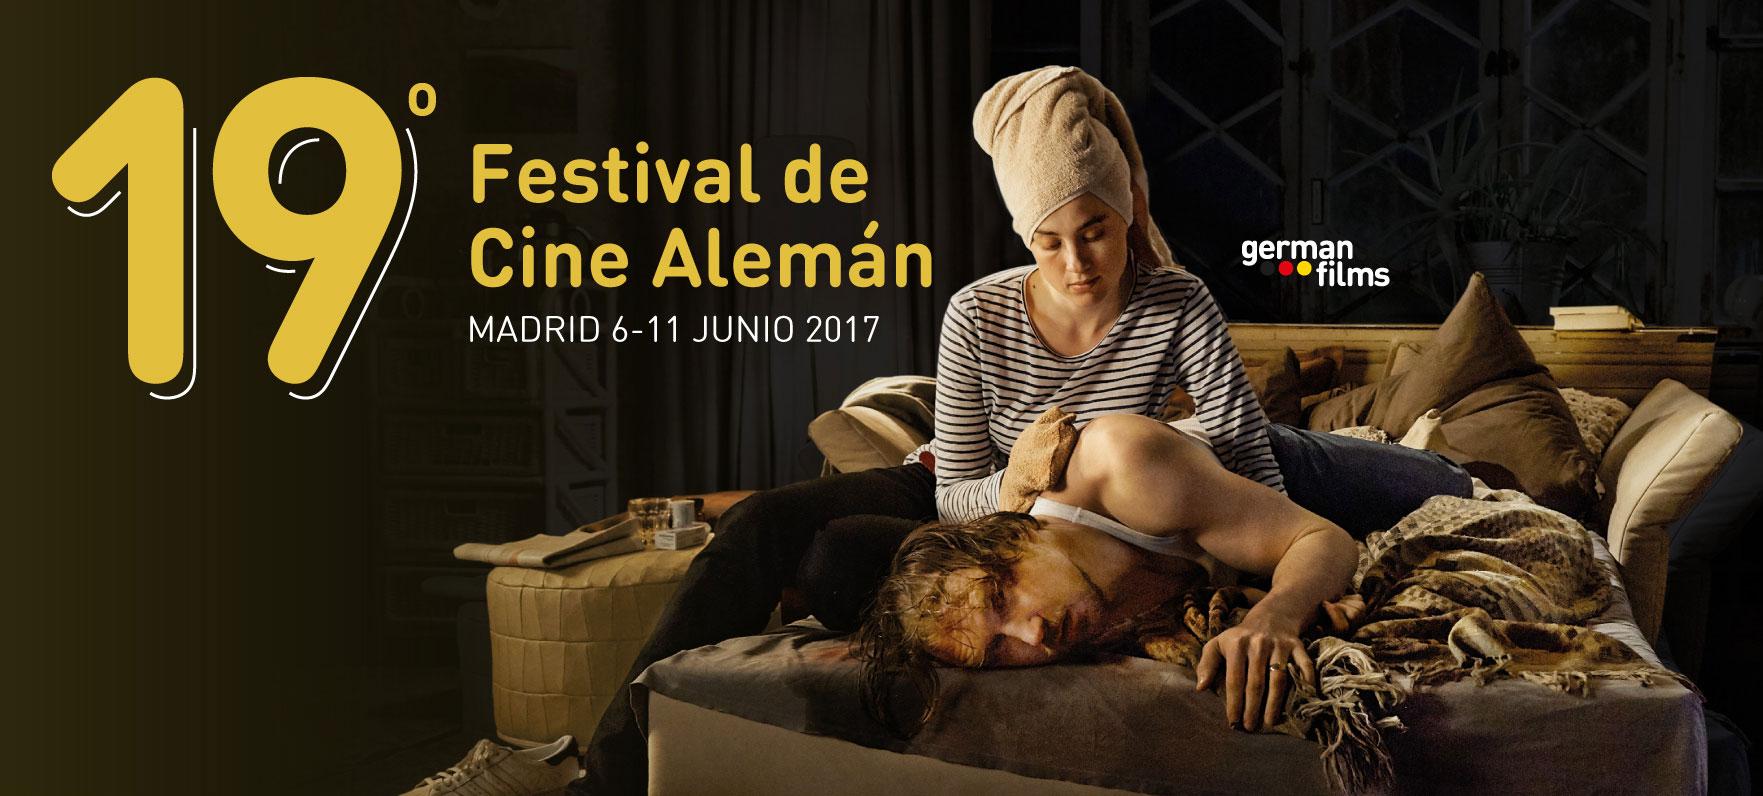 Festival, cine, alemán